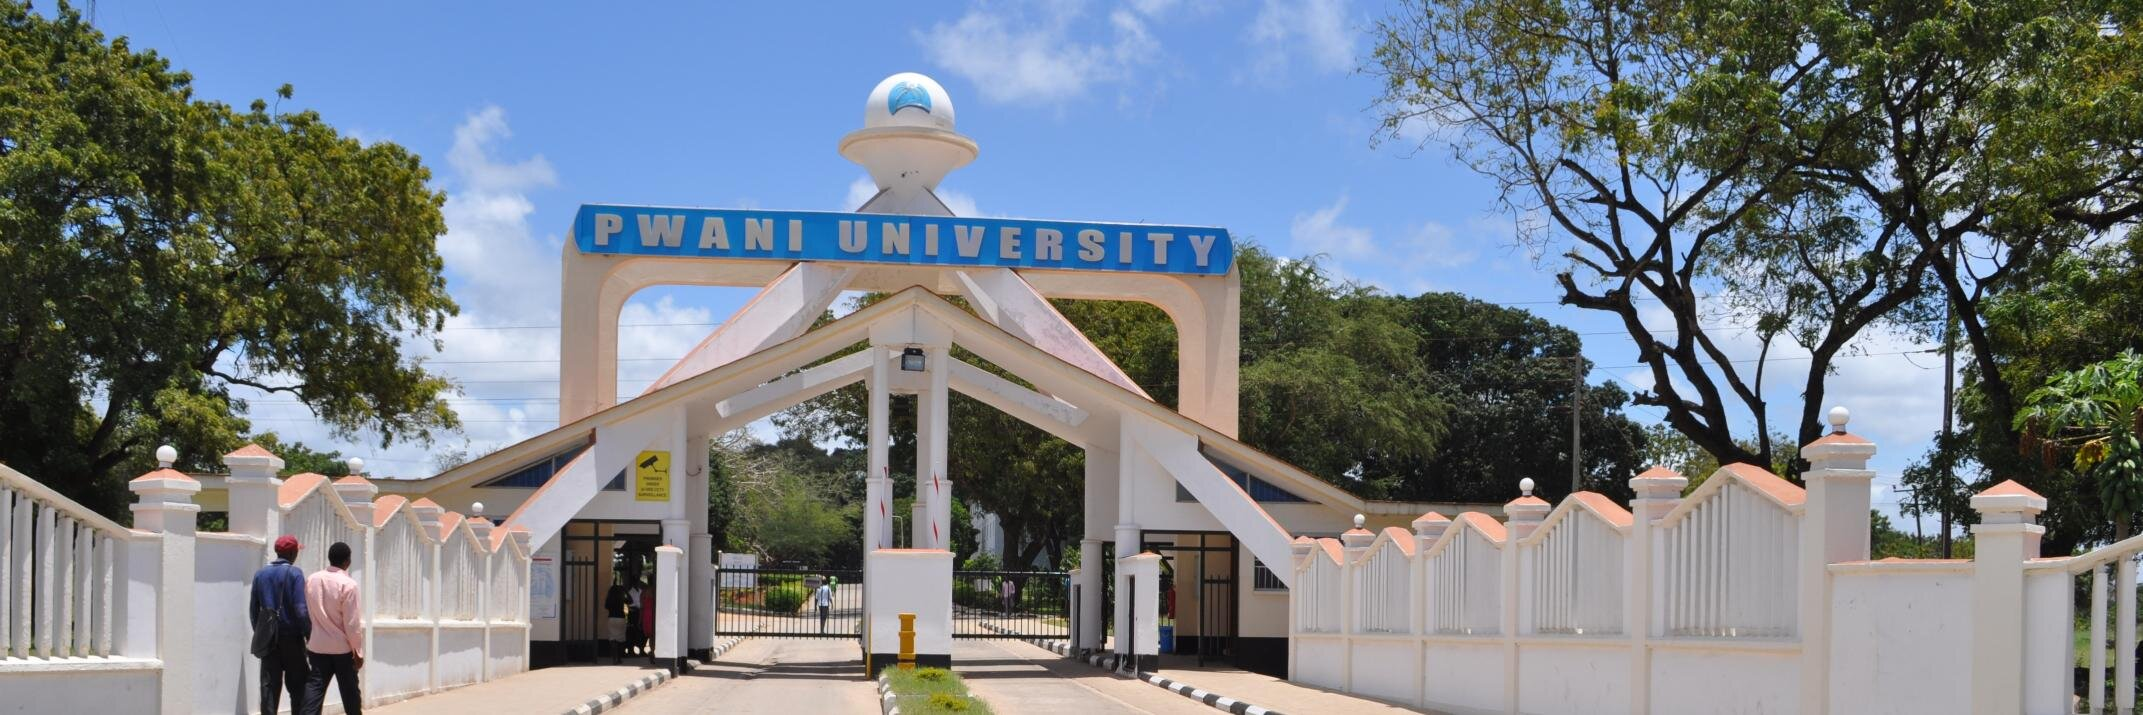 Pwani University's official Twitter account